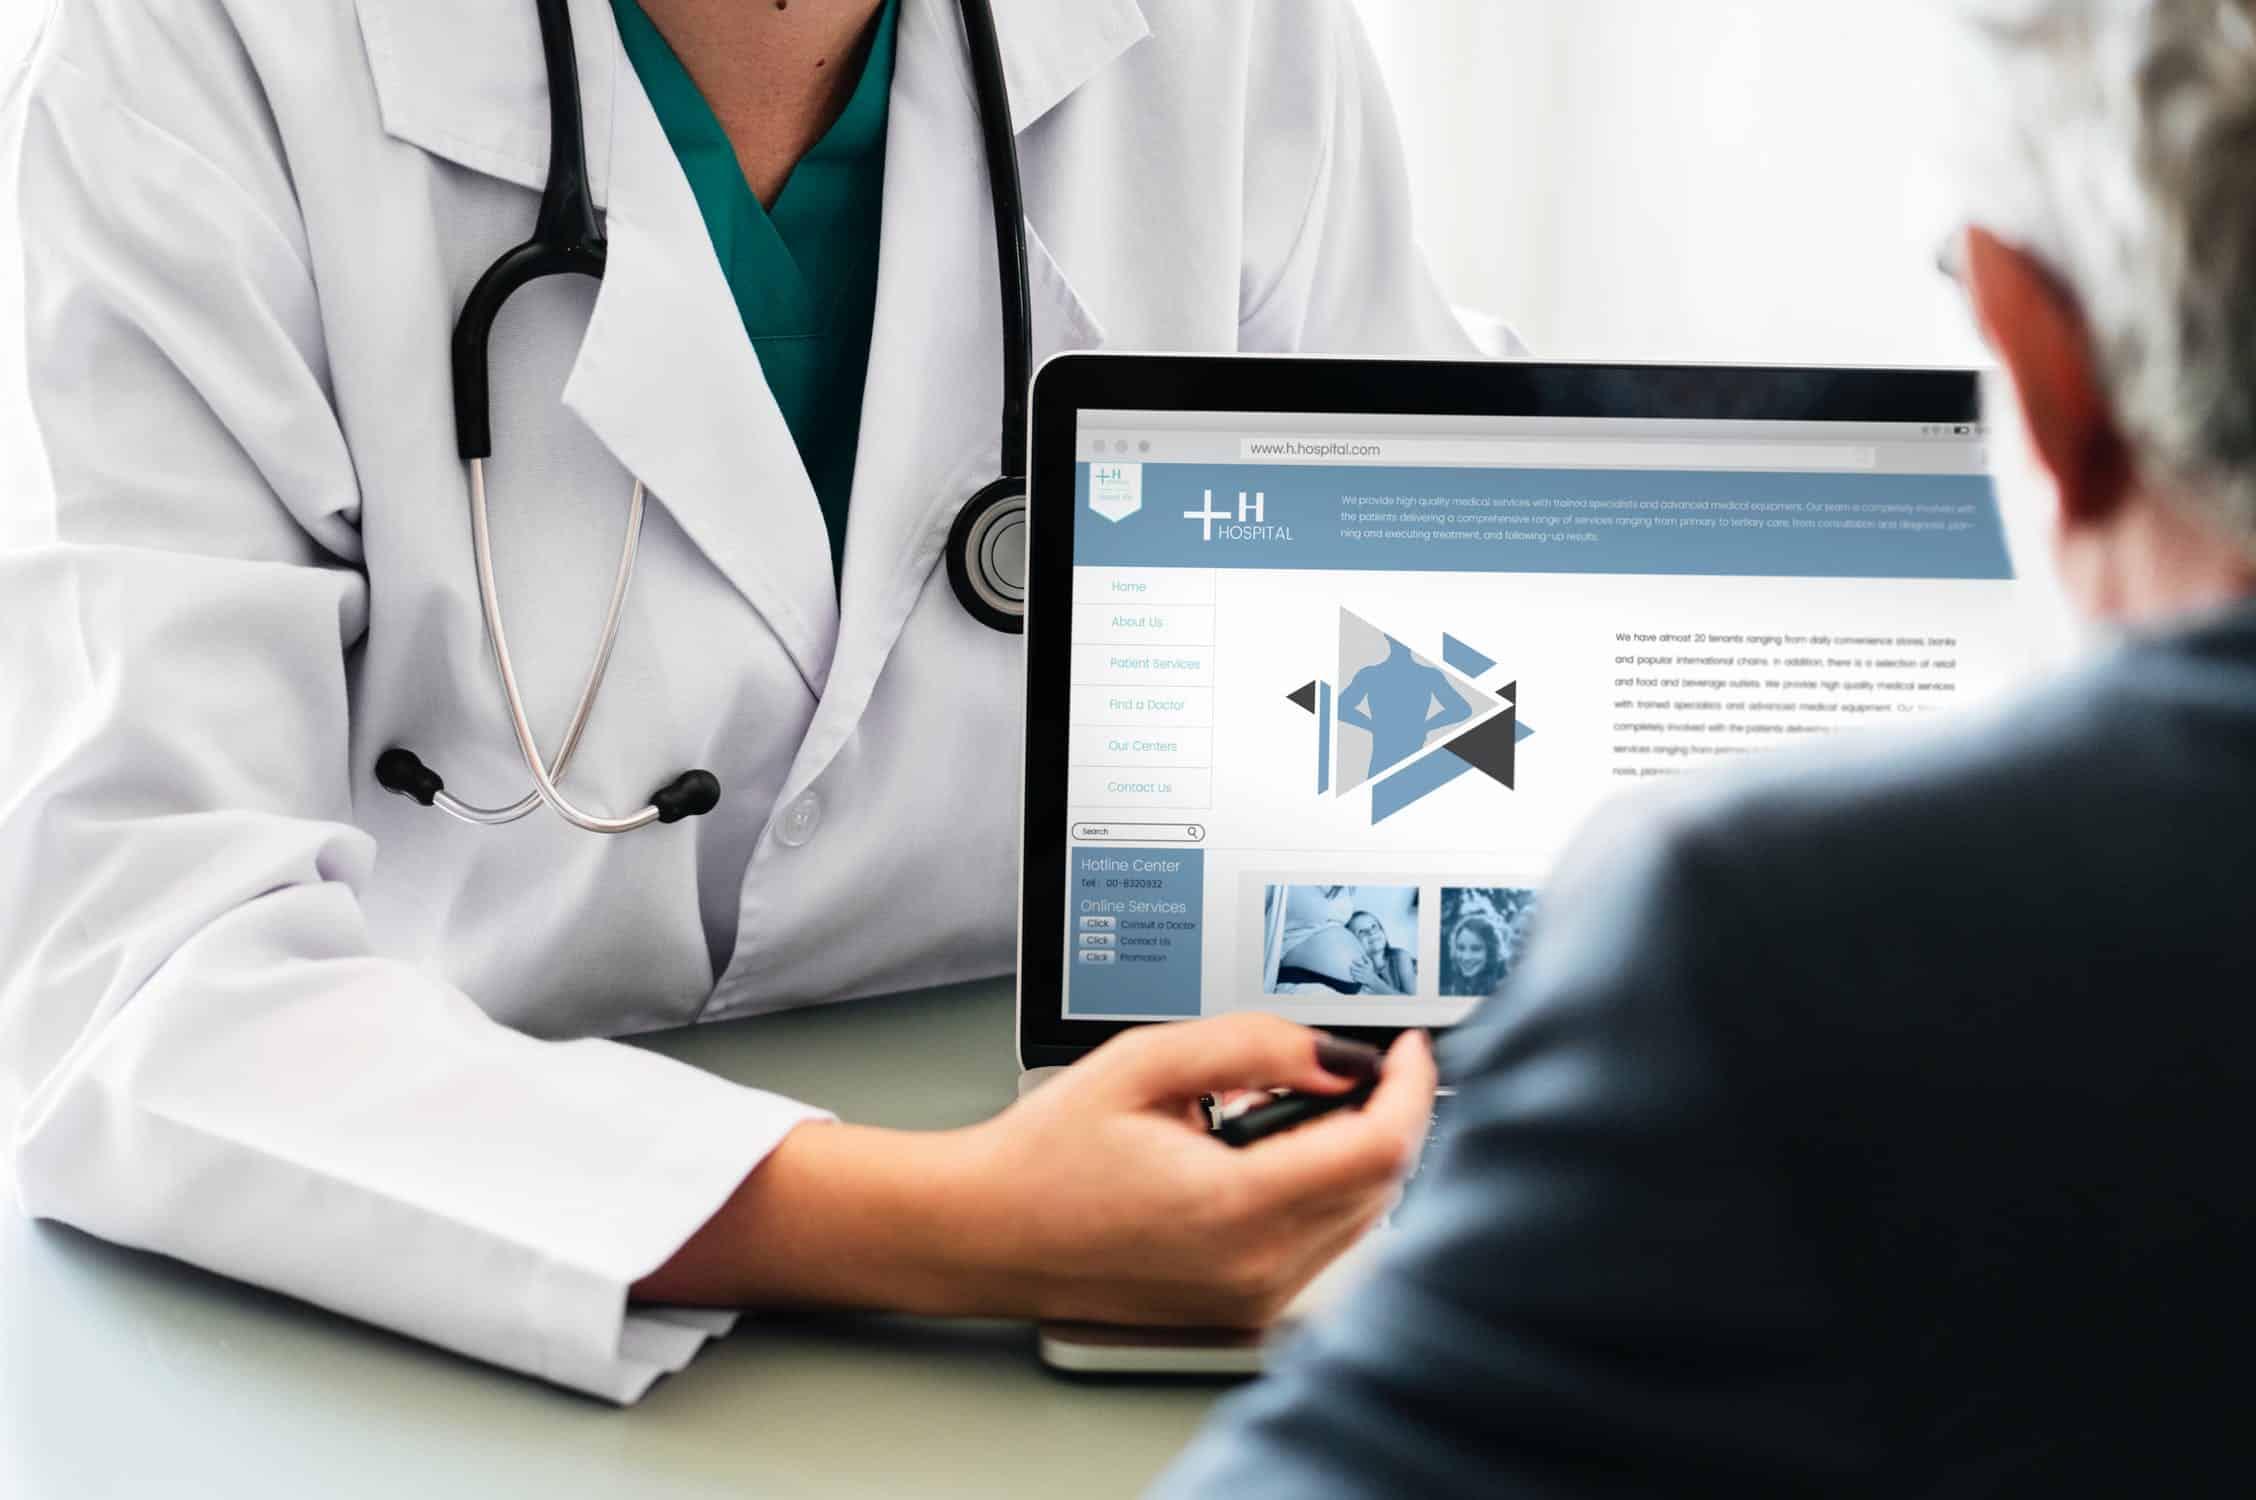 doctor giving advice through app